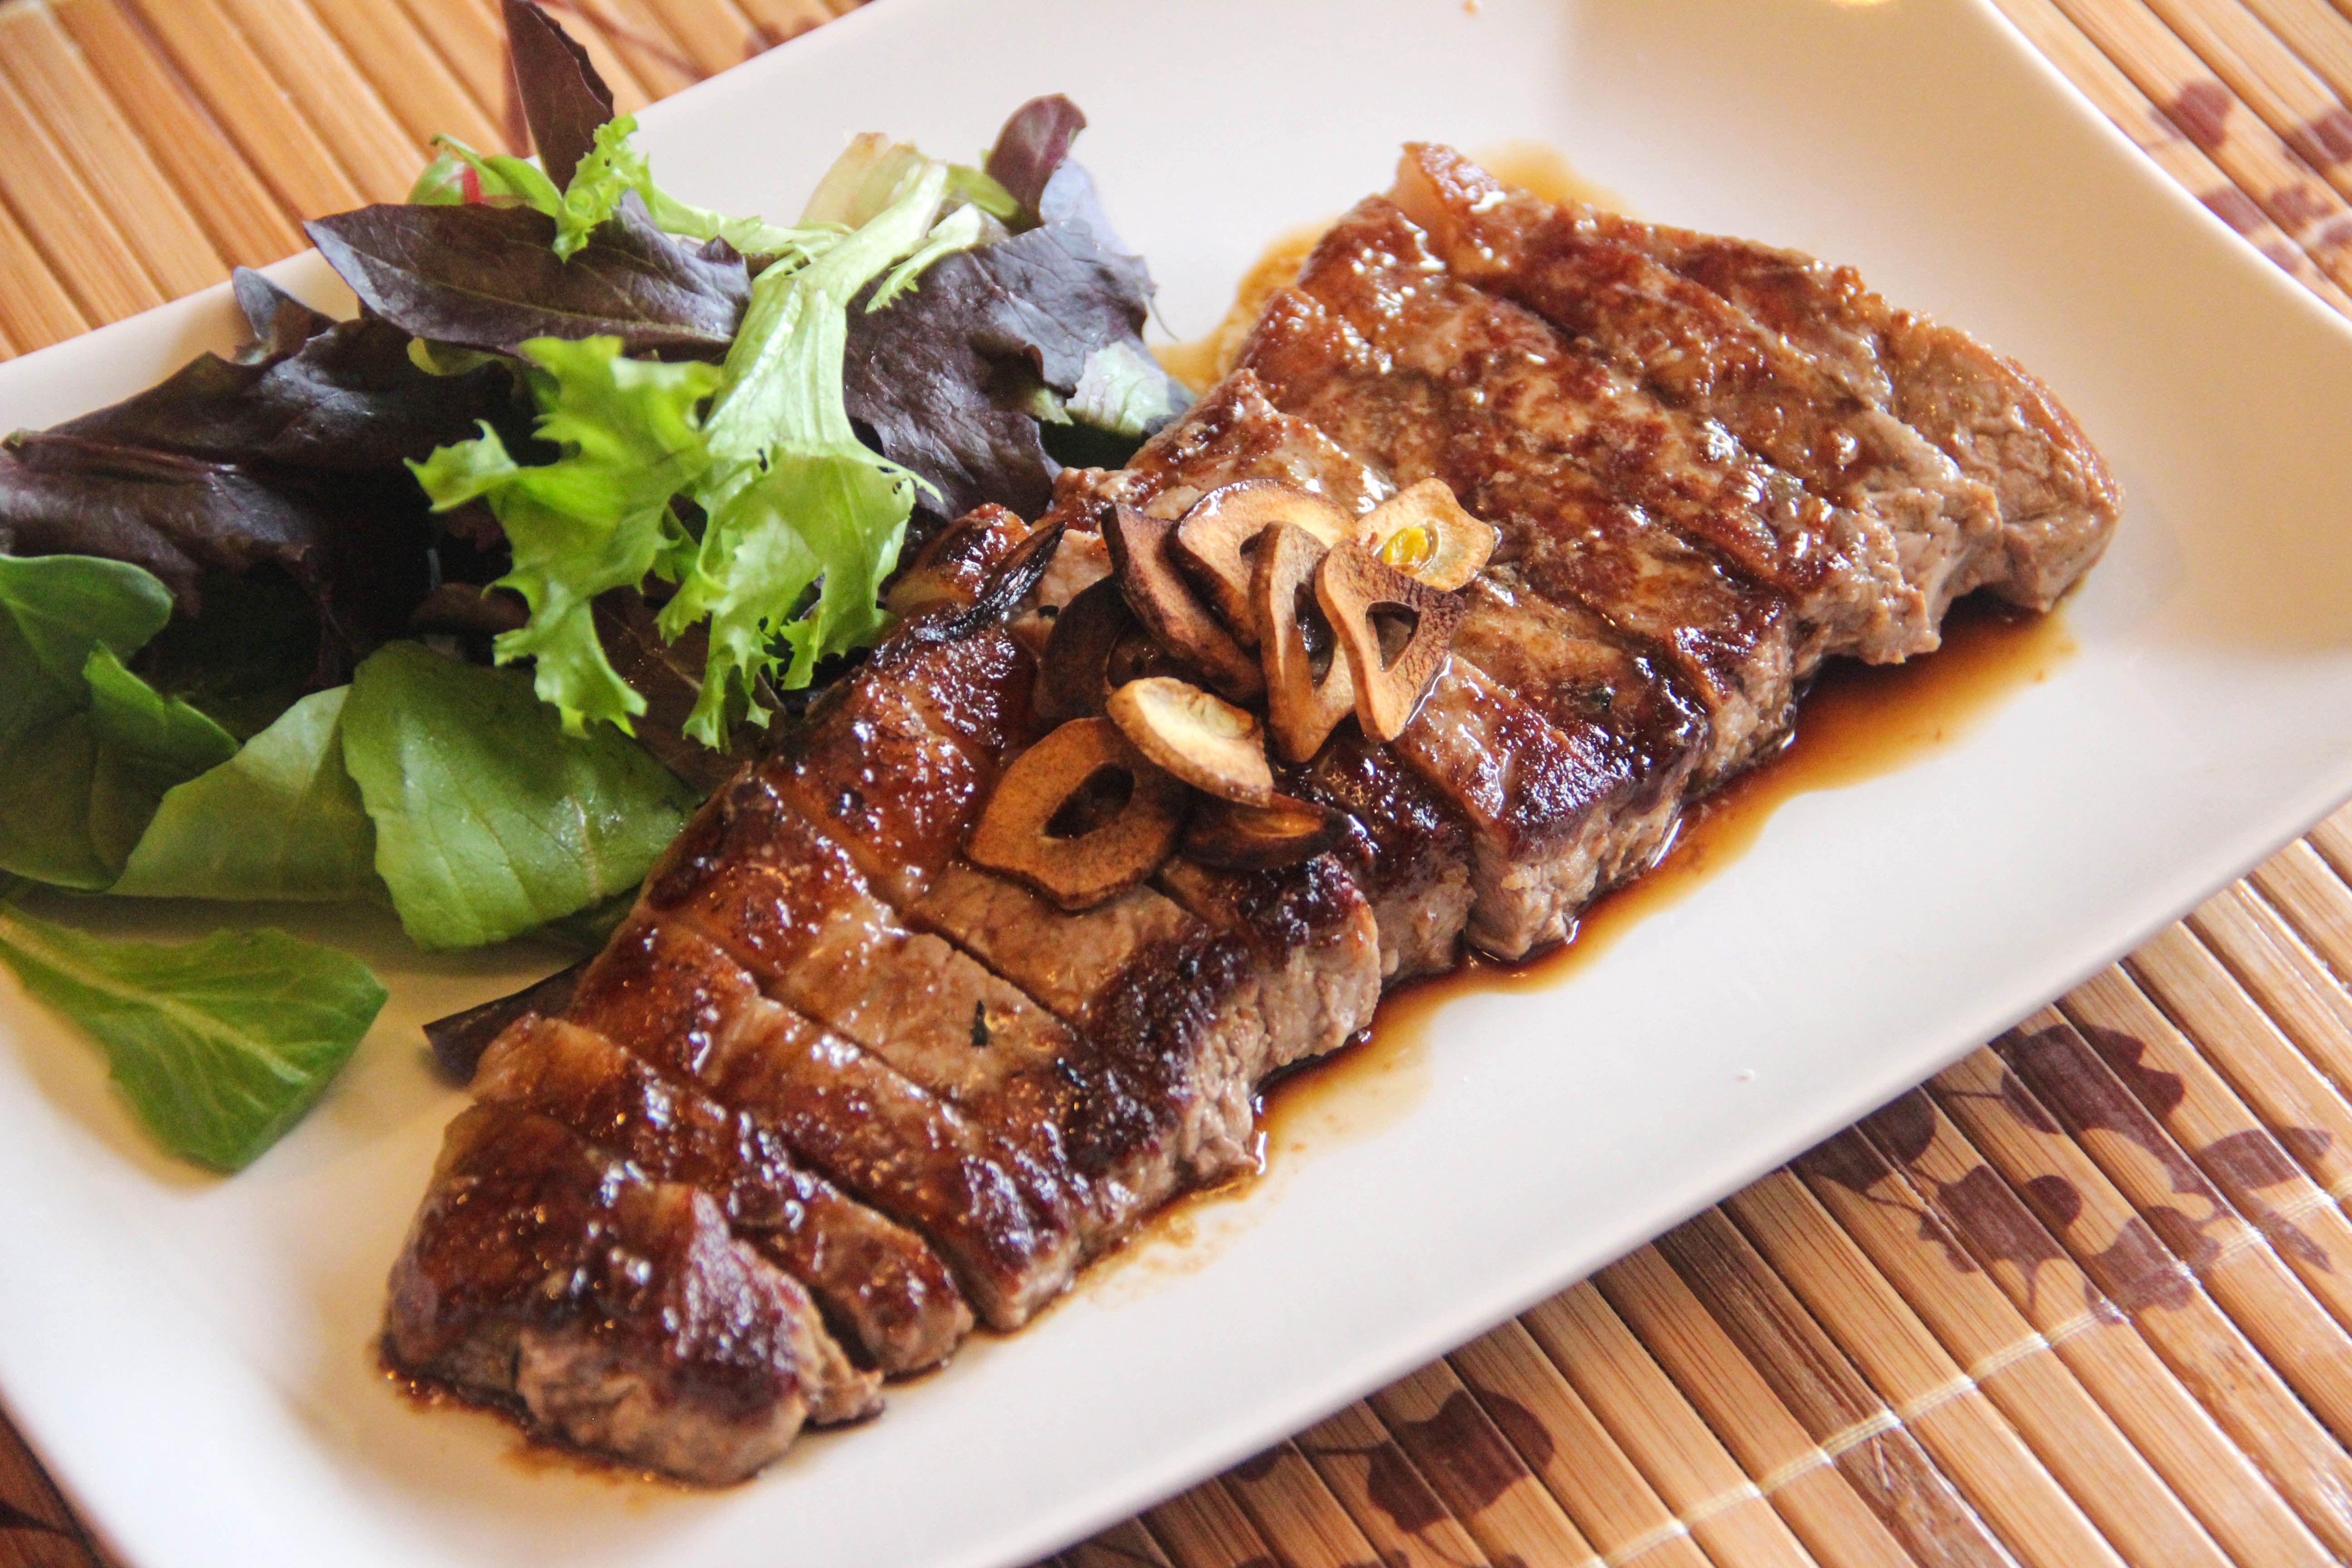 2016 01 01 beef steak picture to download 119238 sharovarka 2016 01 01 beef steak picture to download 119238 big steakjapanese food recipesfilipino forumfinder Images